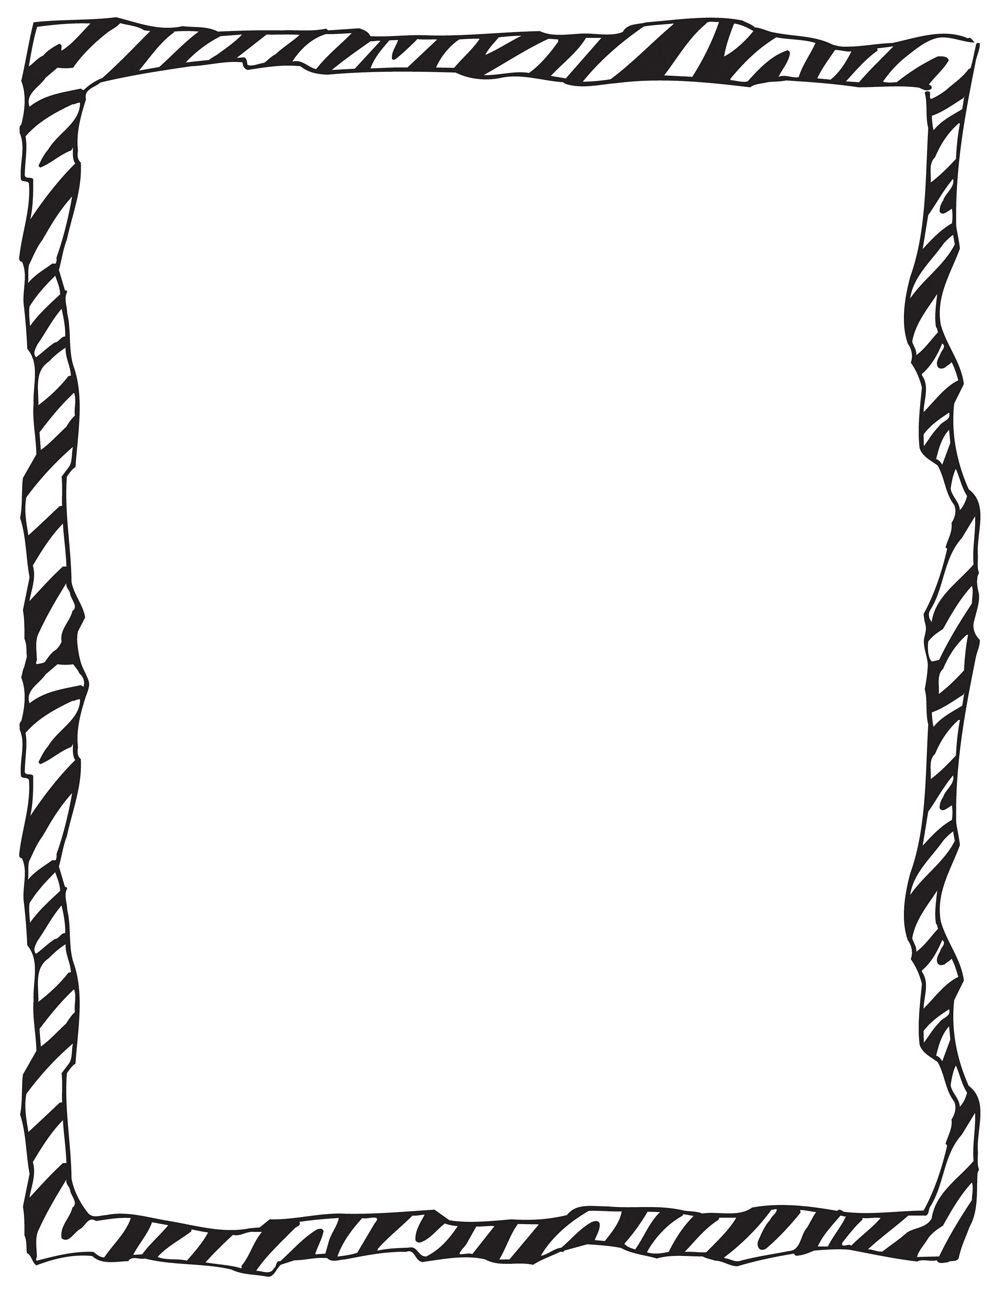 Displaying 15 Images For Animal Print Border Clip Art Borders Zebra Free Clip Art